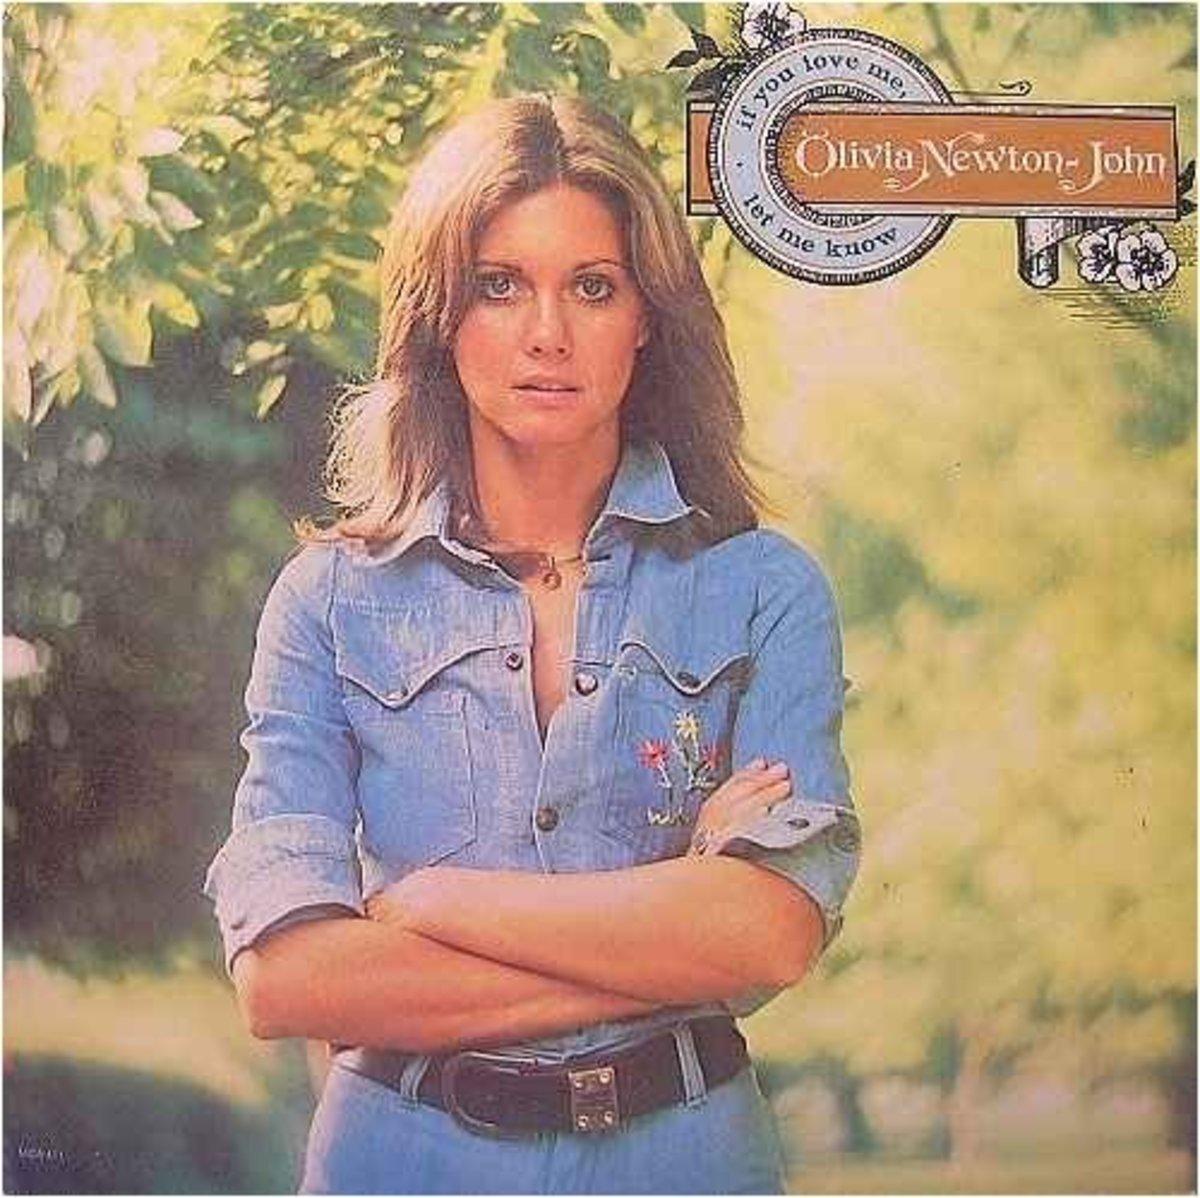 Olivia's classic vinyl album If You Love Me, Let Me Know